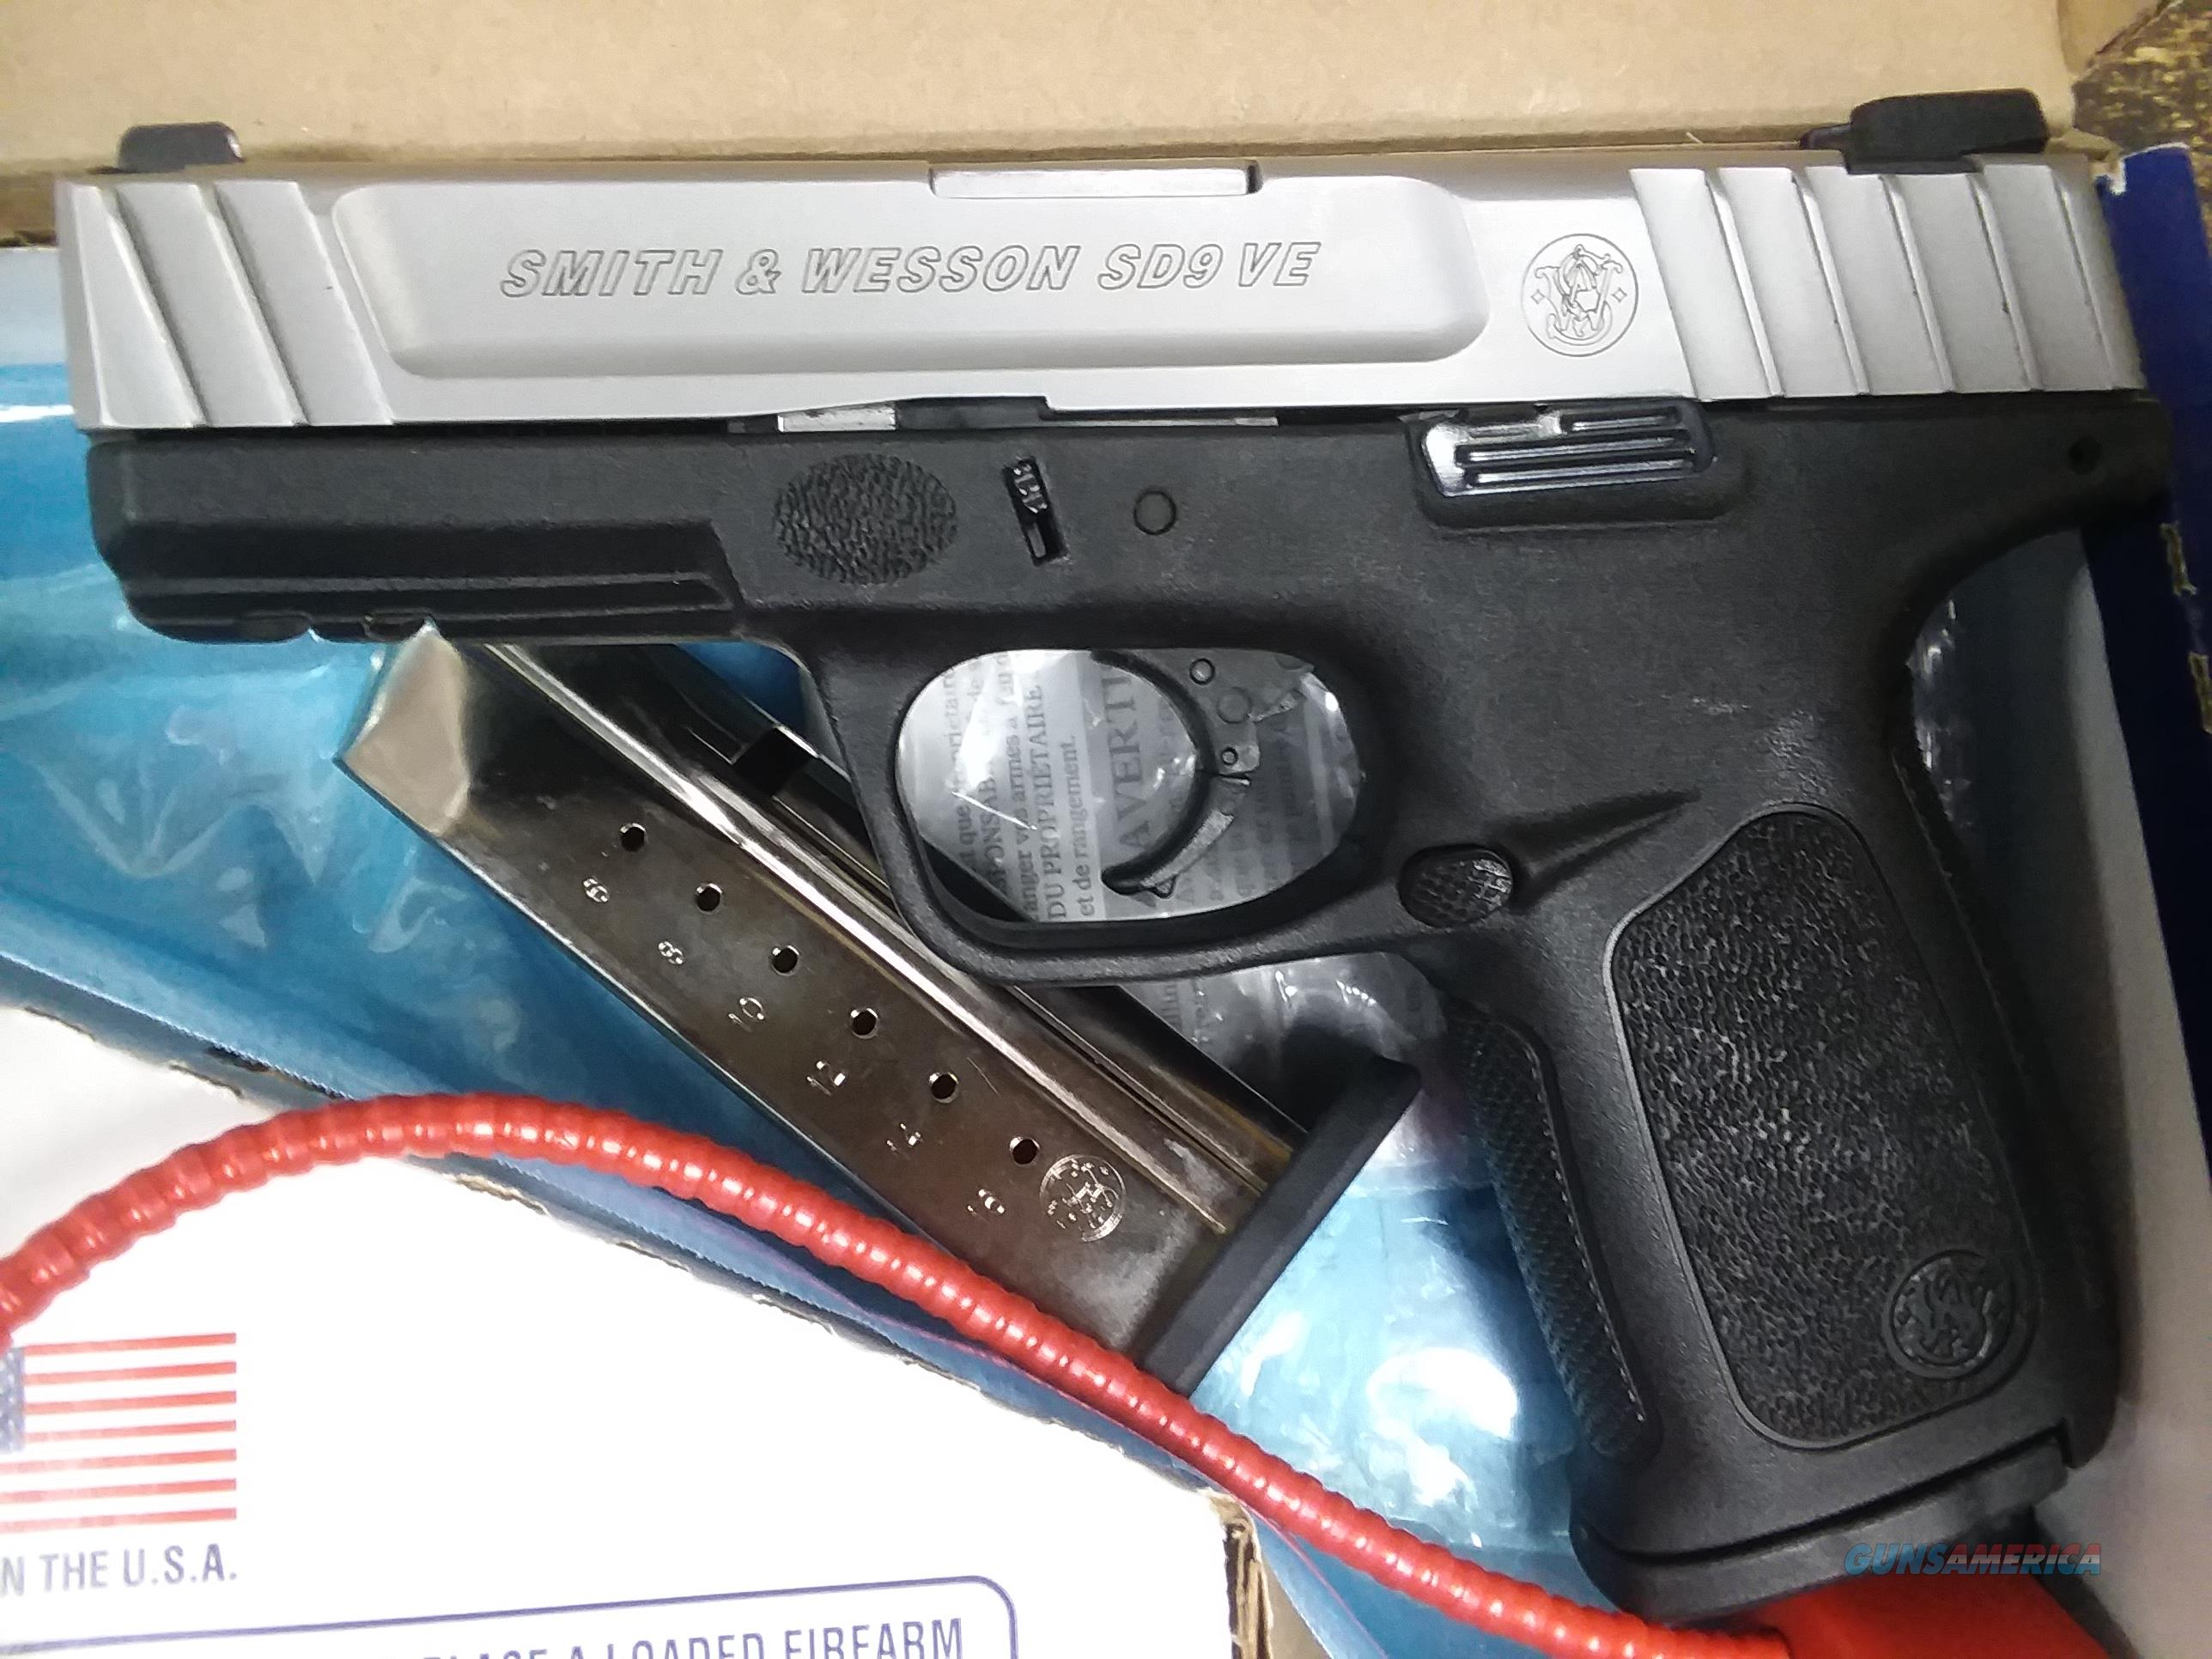 S & W SD 9 VE 9 MM  Guns > Pistols > Smith & Wesson Pistols - Autos > Polymer Frame